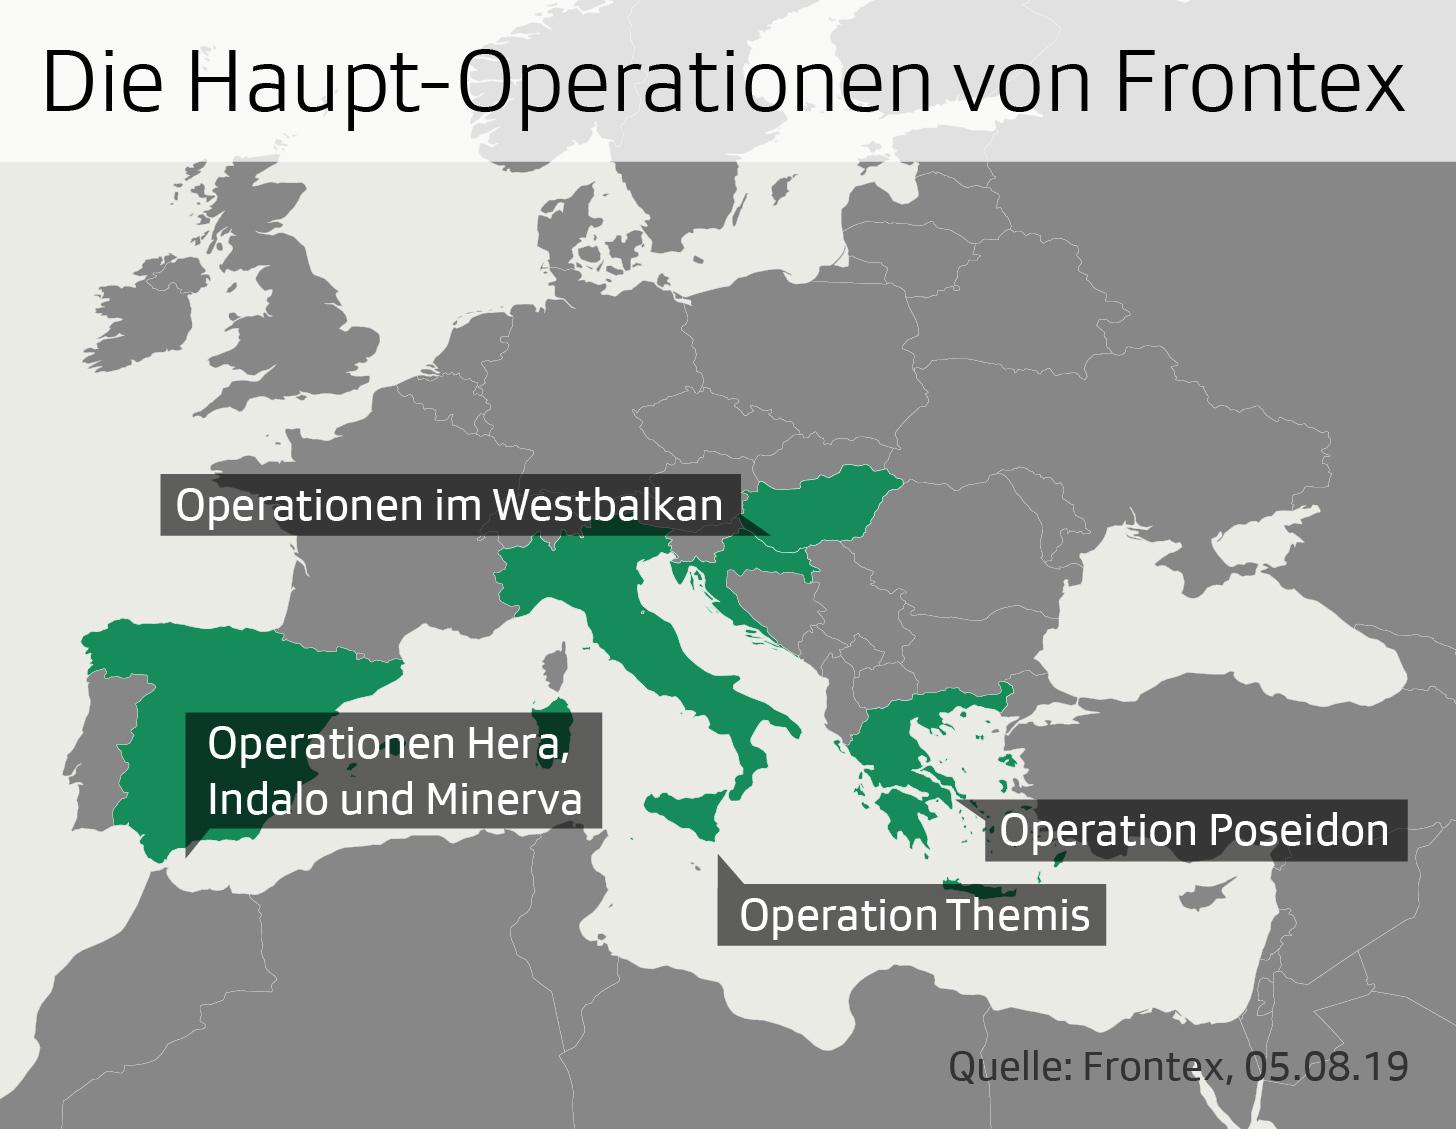 Operationen Frontex